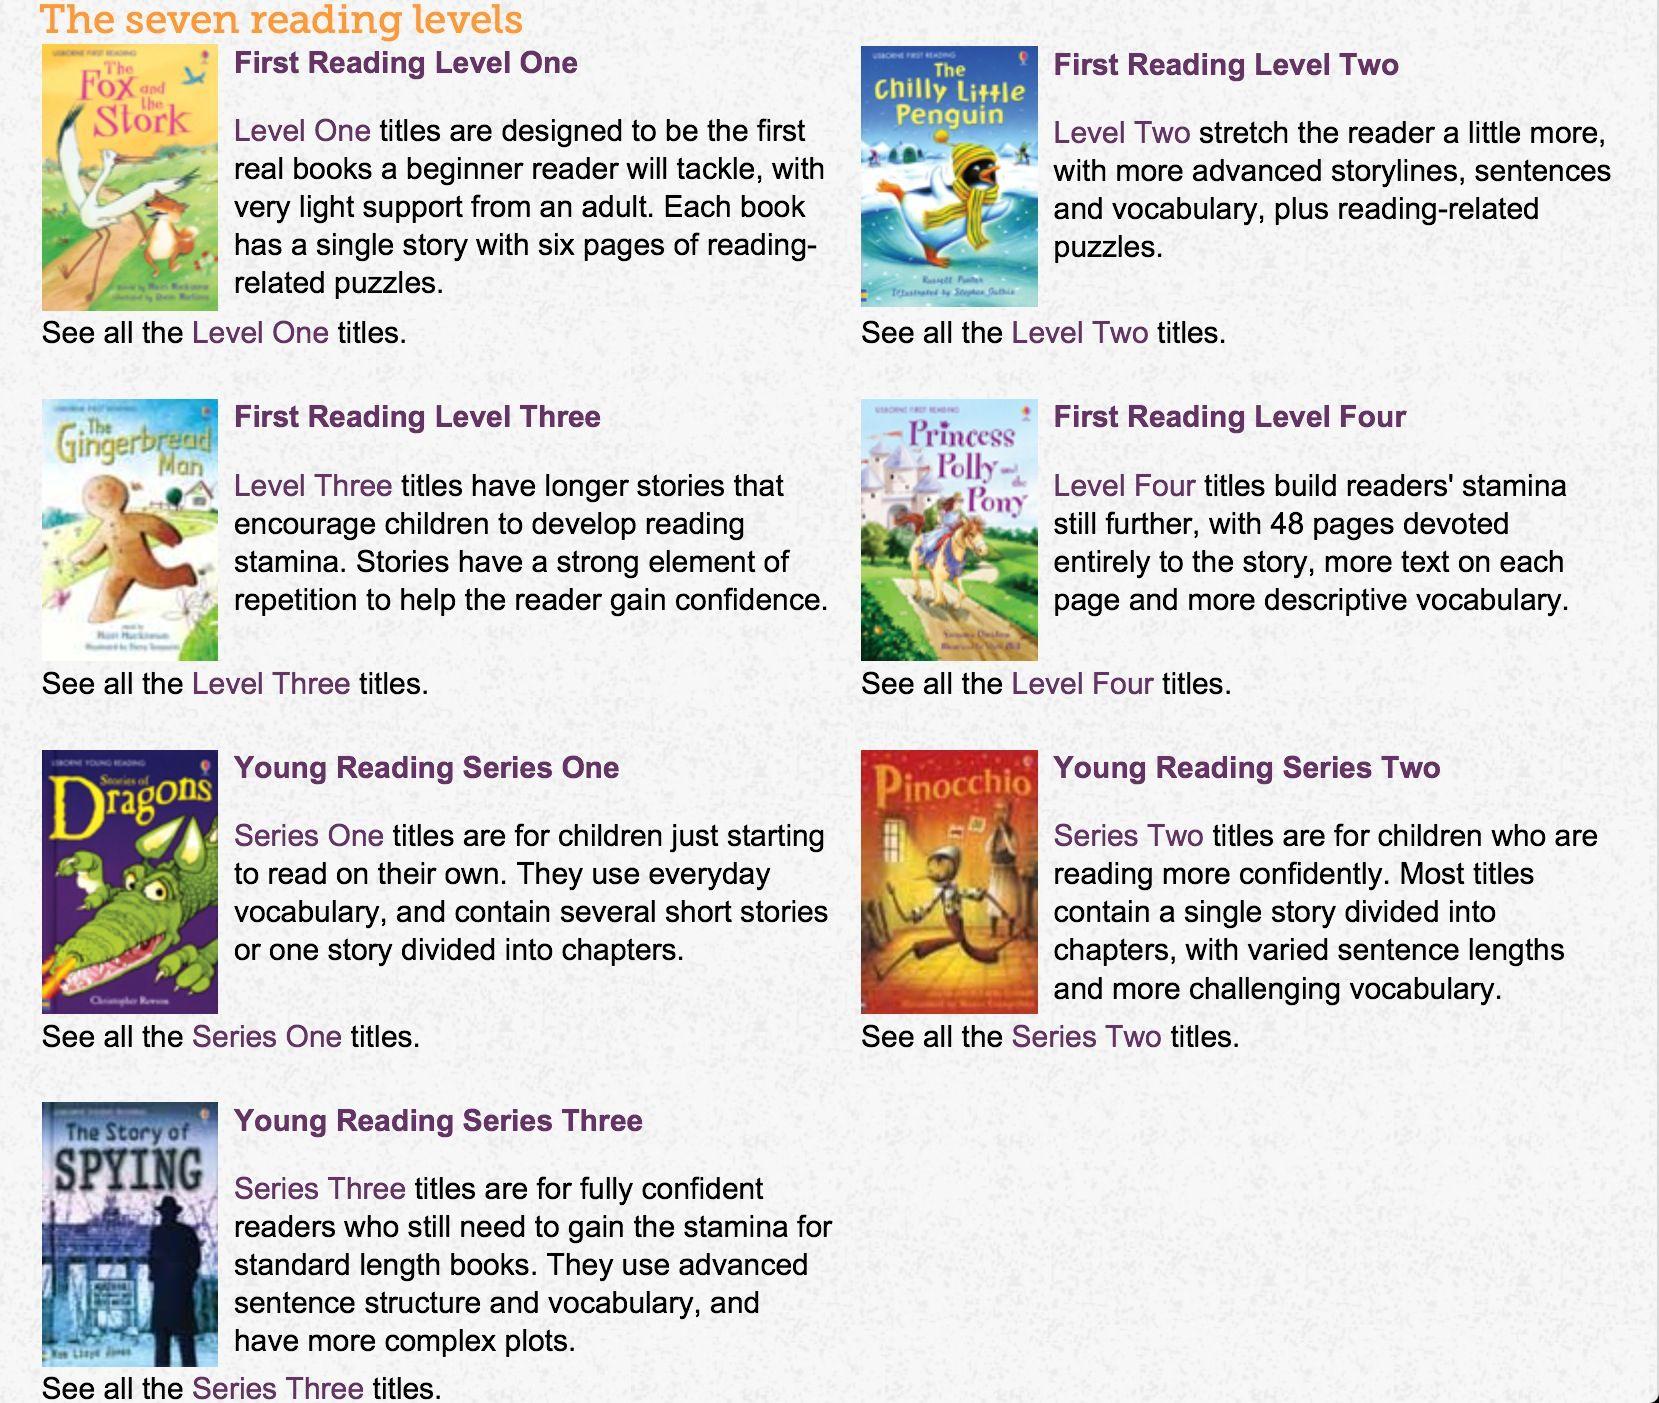 Description Of Reading Program Levels Kids Love Reading Usborne Books Y3932 Myubam Com Usborne Books Usborne Beginner Reader What reading level should year old be